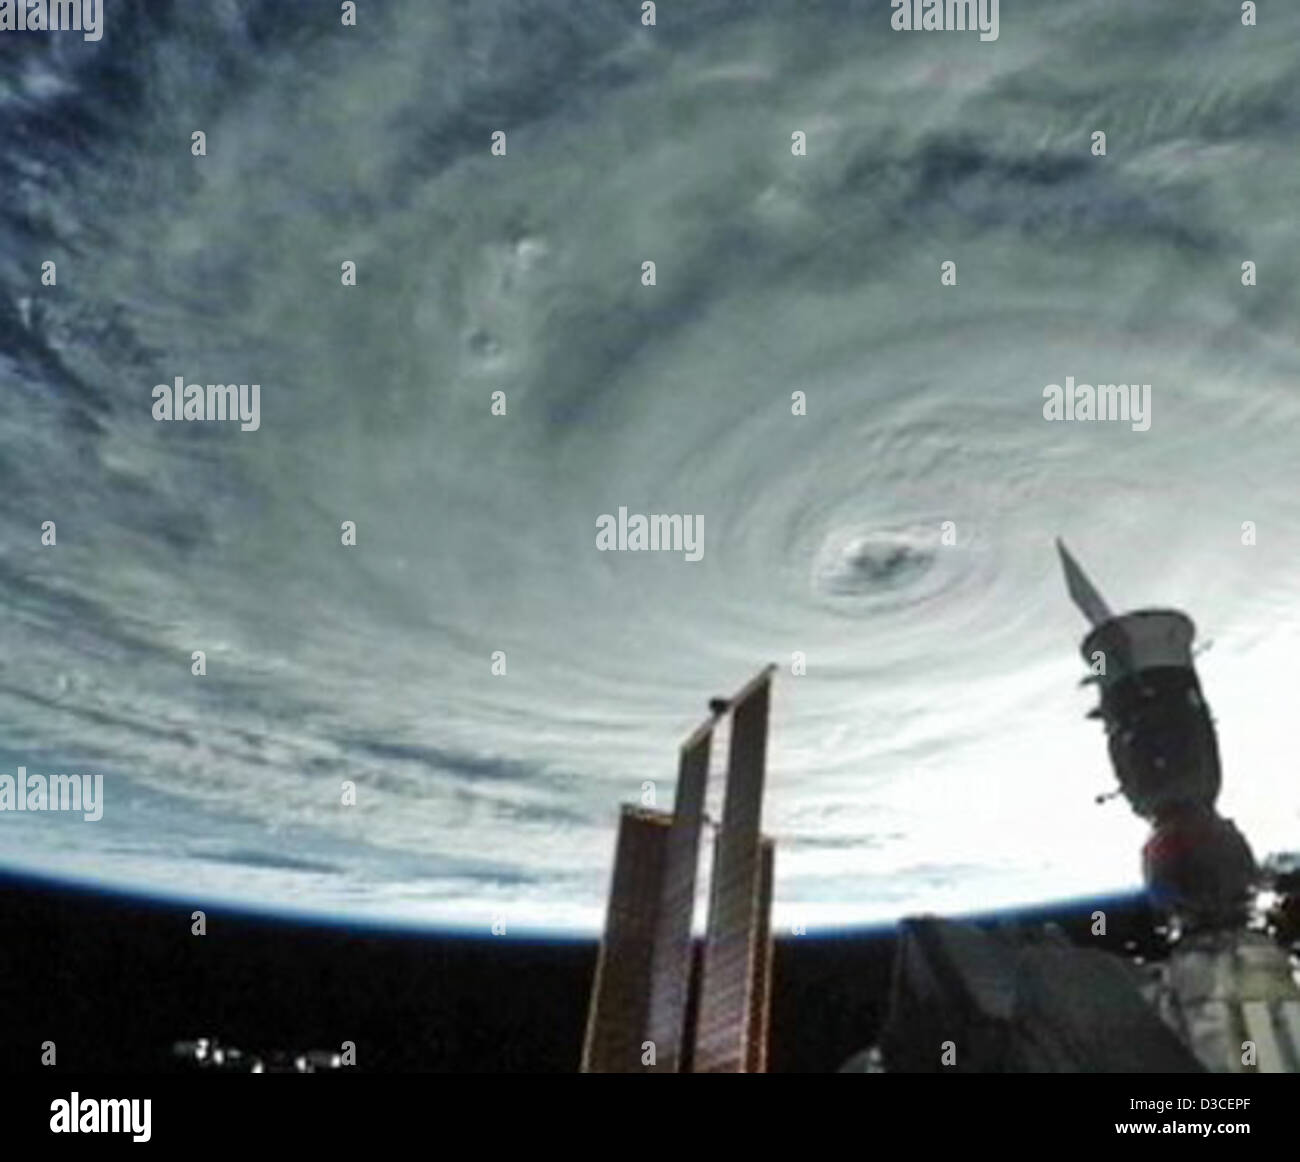 Hurrikan Danielle (NASA, internationale Raumstation Wissenschaft, 27.08.10) Stockbild